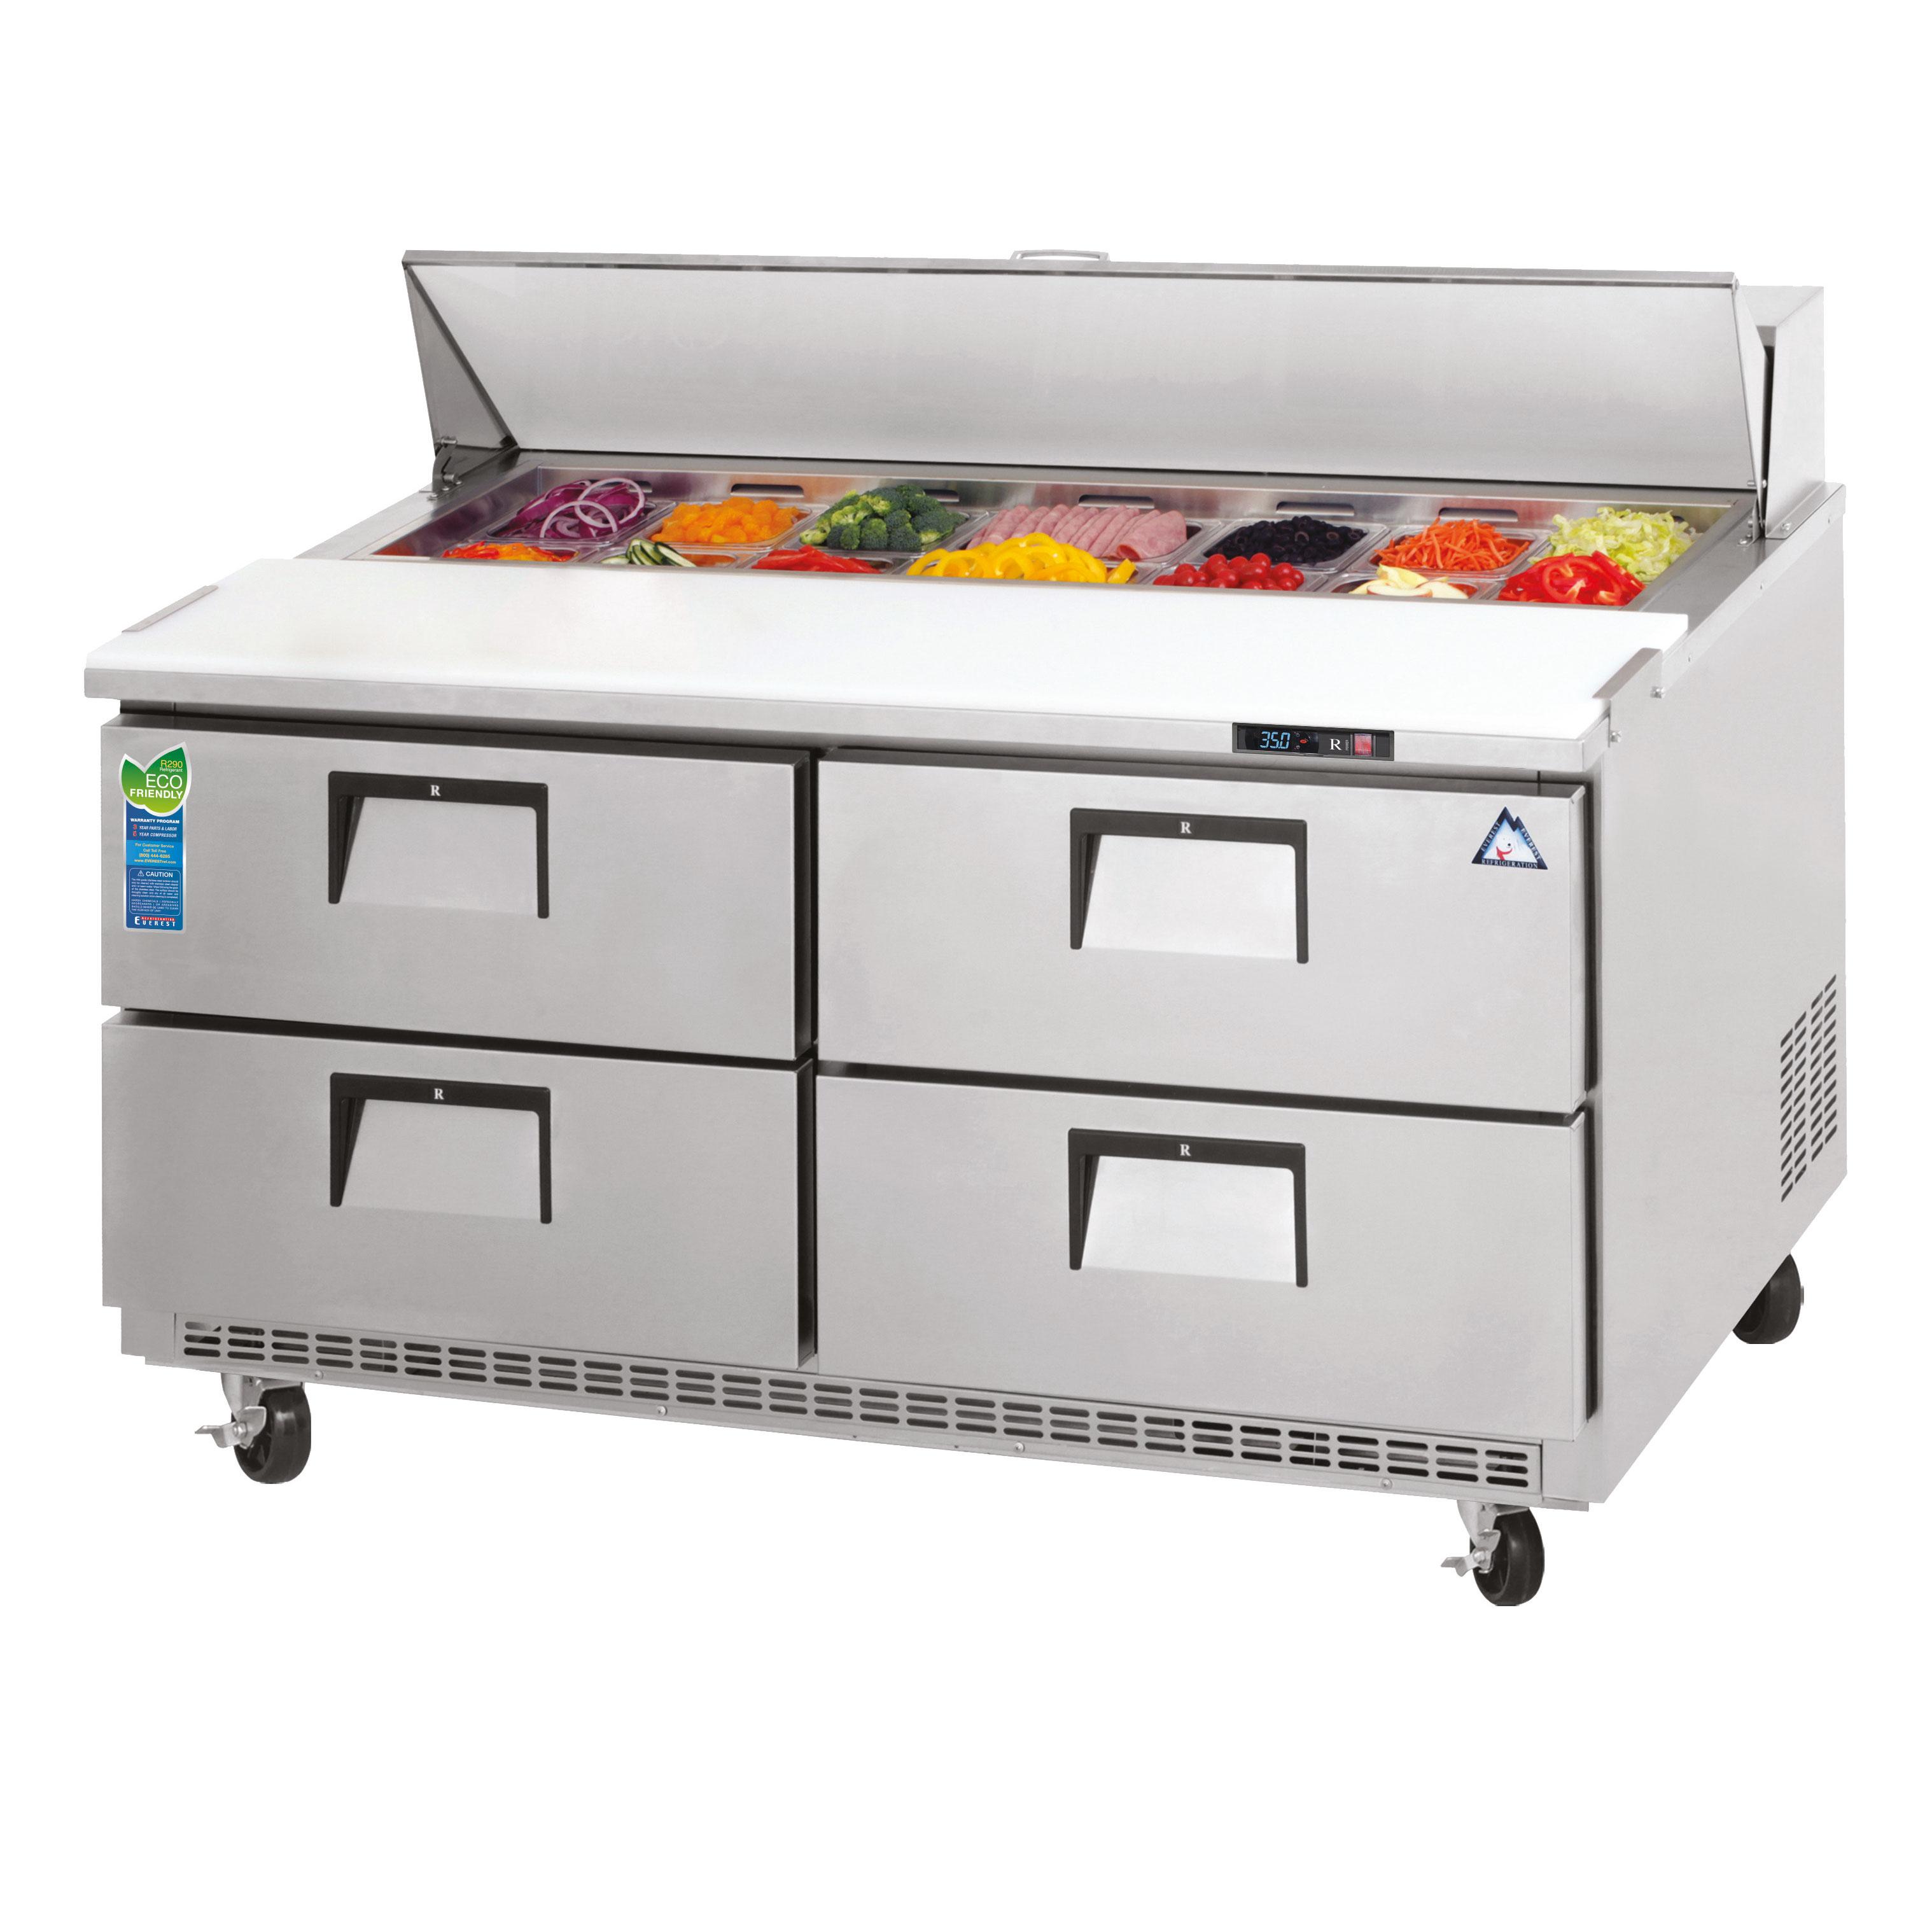 Everest Refrigeration EPBNR2-D4 refrigerated counter, sandwich / salad unit